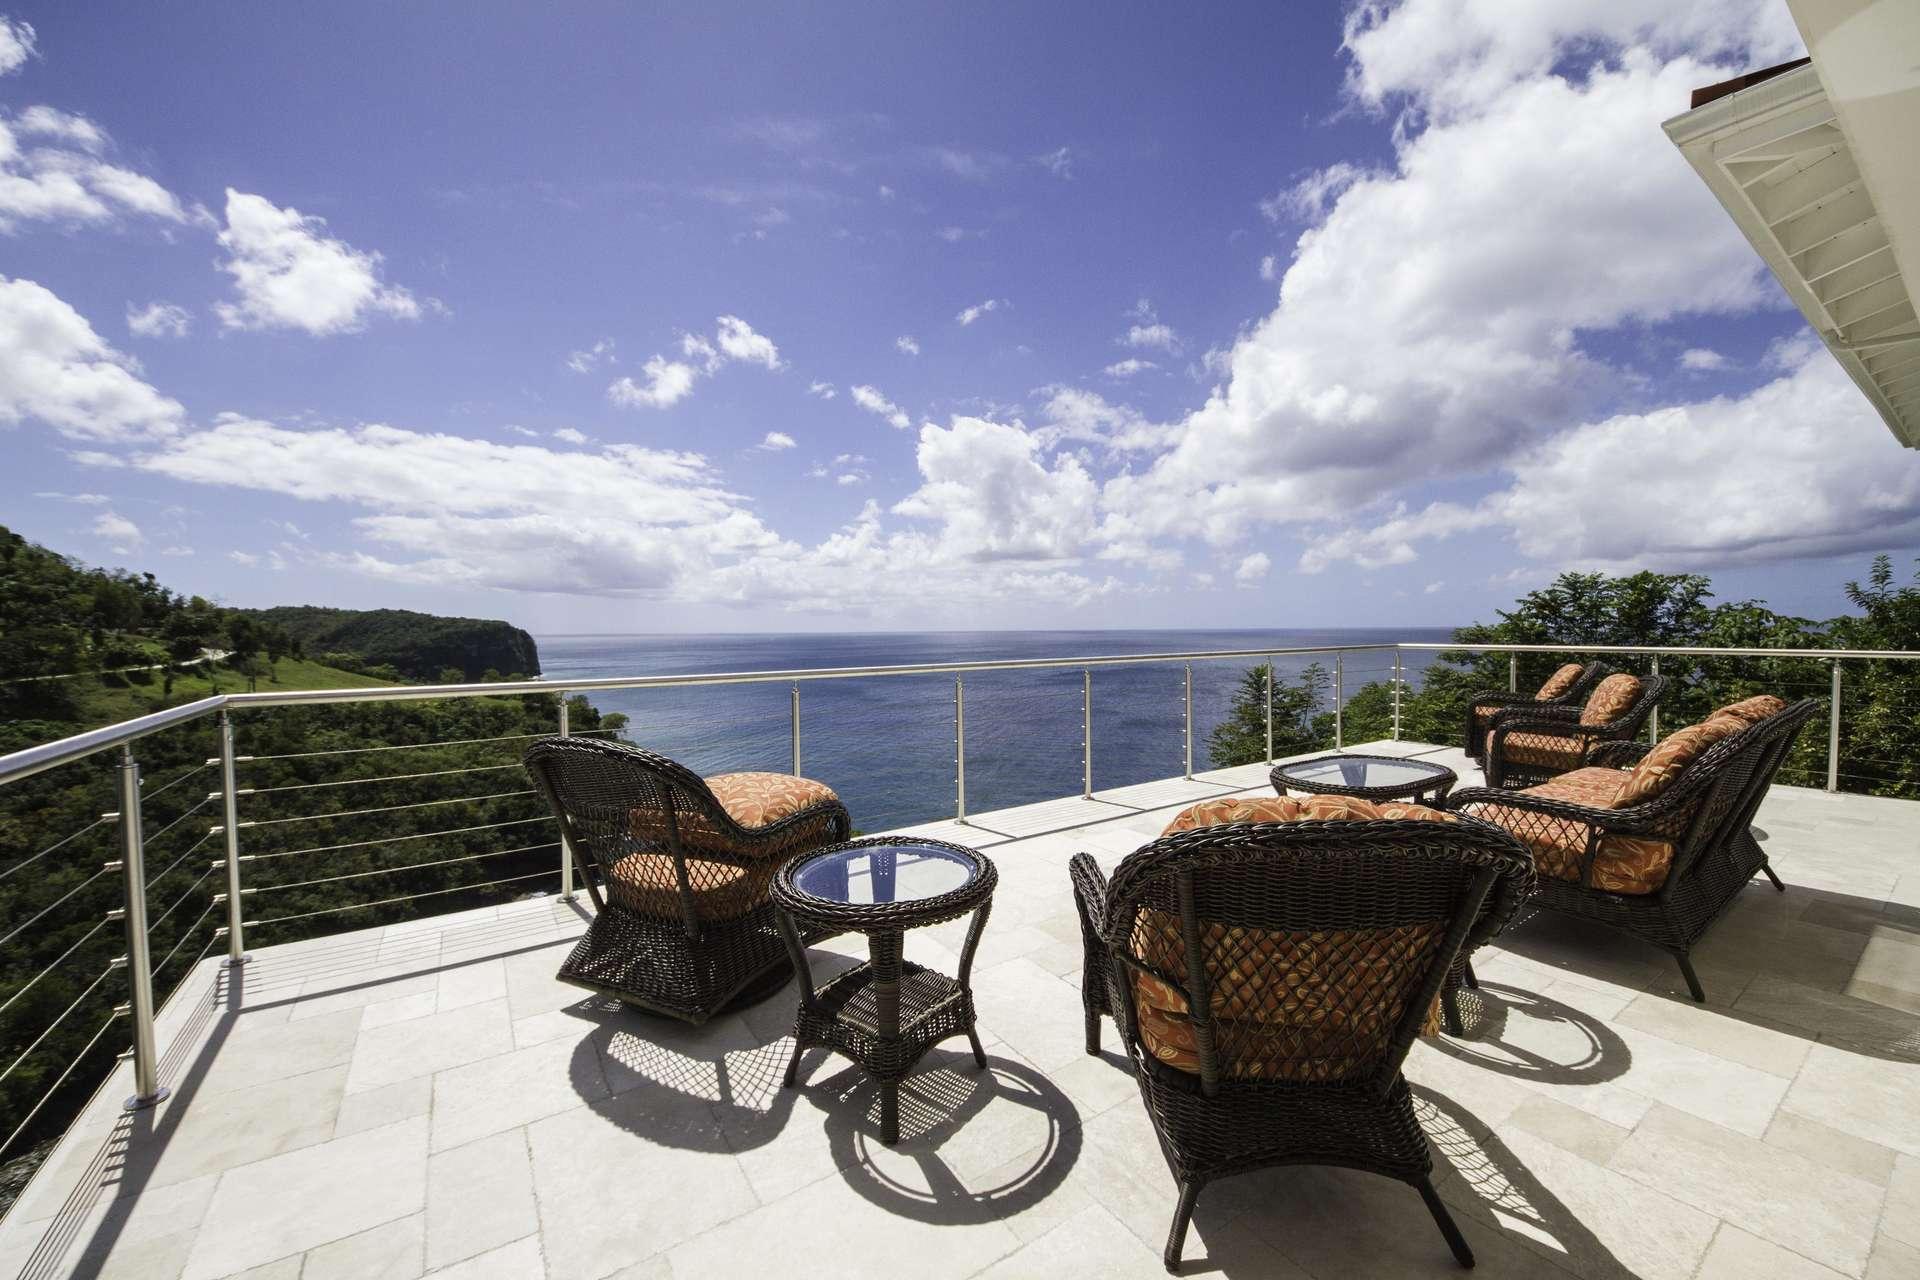 Luxury villa rentals caribbean - St lucia - Marigot bay - Trou Rolland - Image 1/23